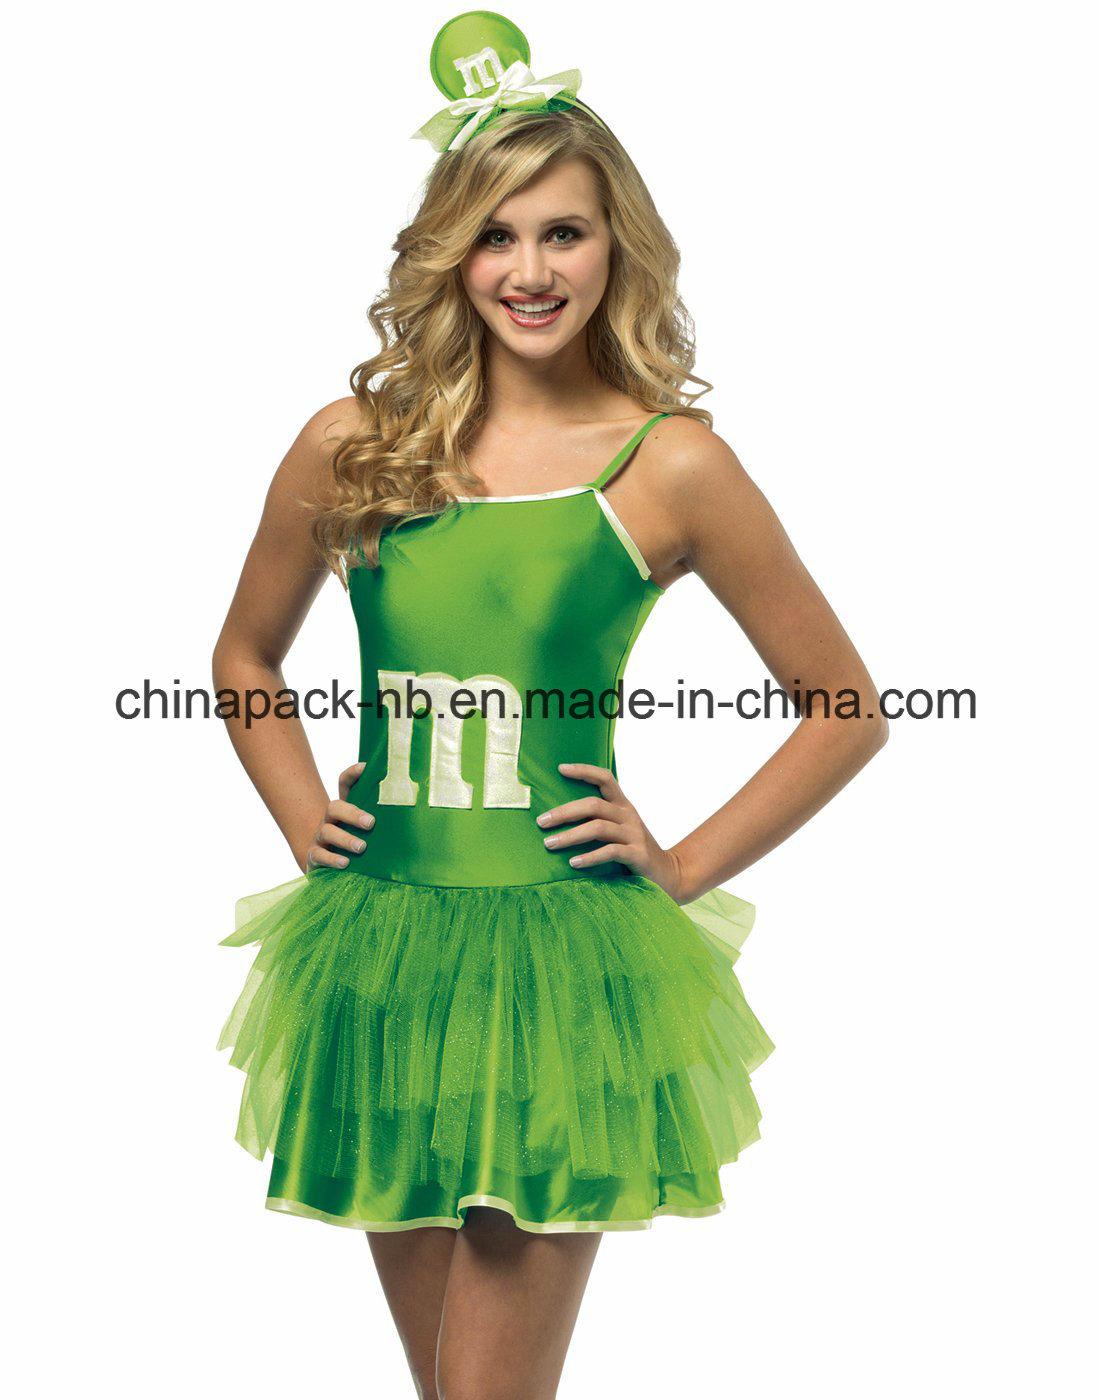 Mini Vestido M&M Sassy Verde Tutú Adolescente Niñ as Disfraz Adolescente (CPGC7003X)